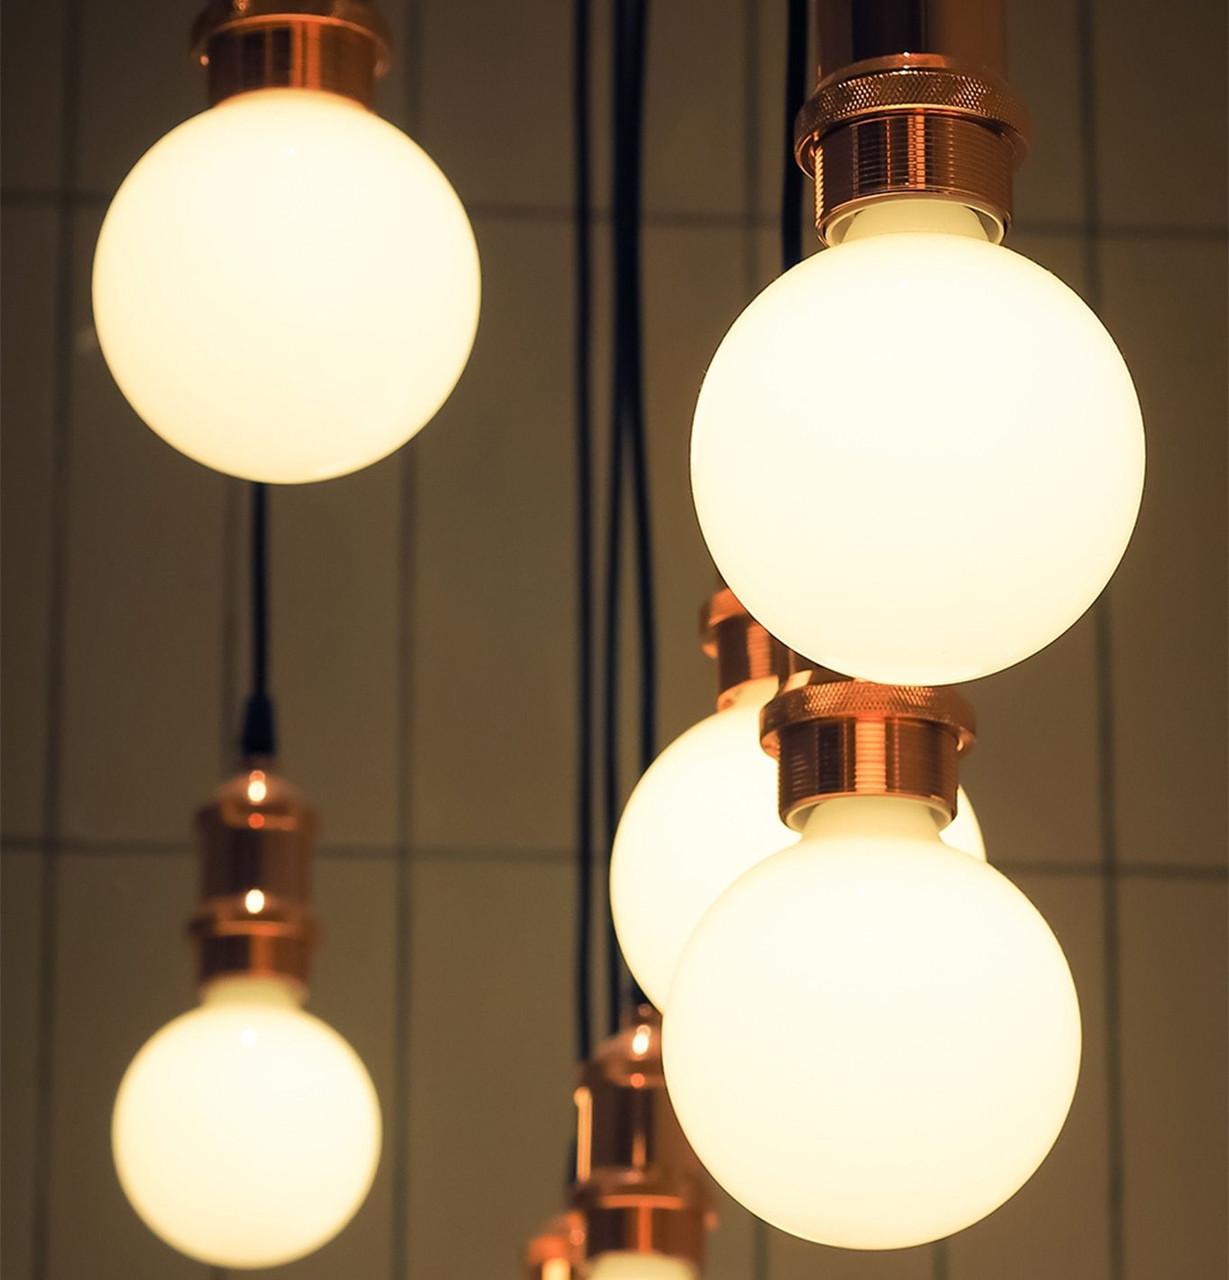 Crompton Lamps LED G80 6 Watt Light Bulbs